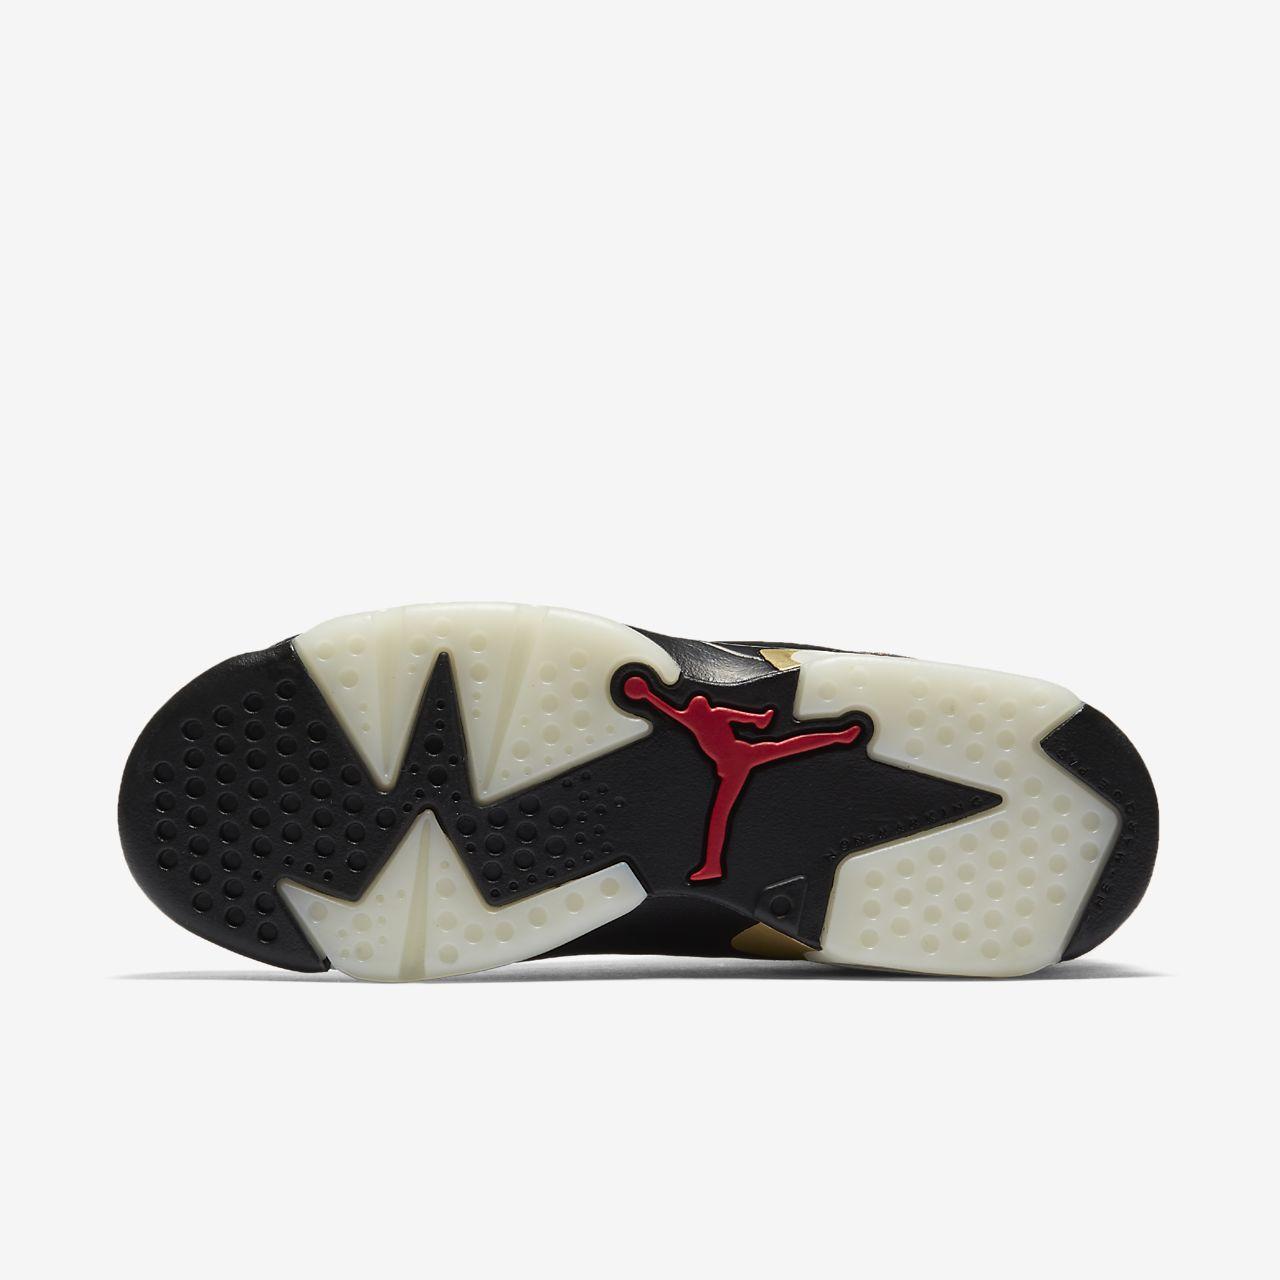 d49968ba0f2 Air Jordan 6 Retro CNY Older Kids' Shoe. Nike.com PH